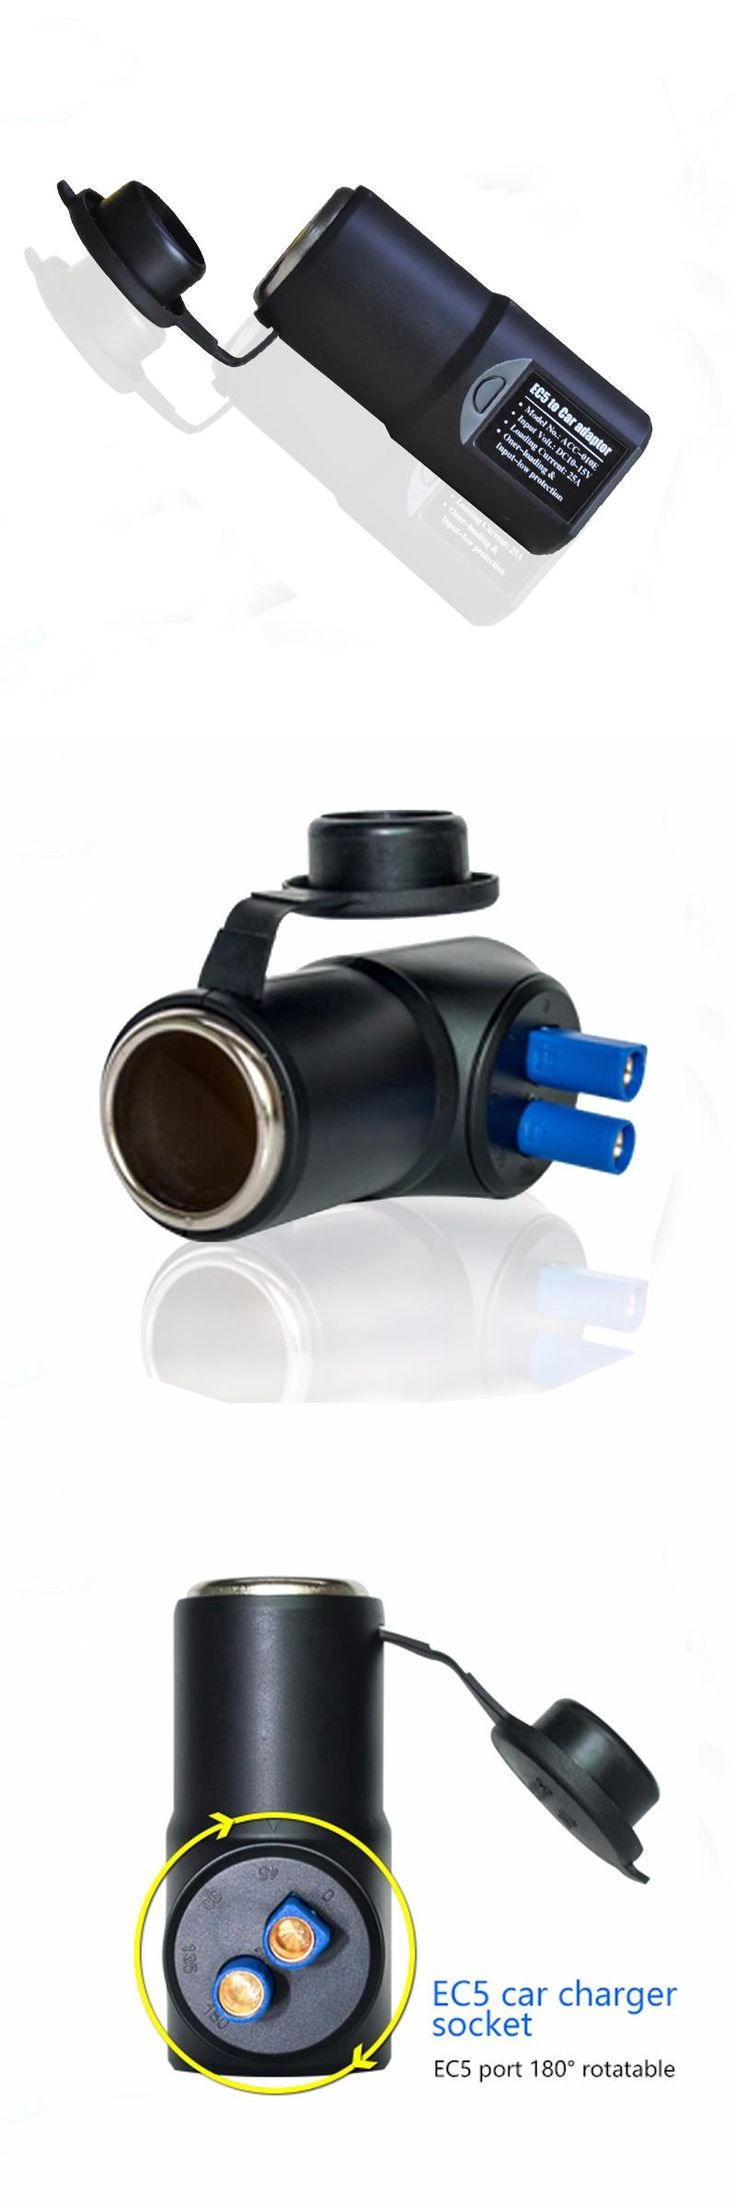 High Quality Car Jump Starter Accessory 12V EC5 Car Cigarette Lighter Socket Charge For Car Camera And Car Refrigerator